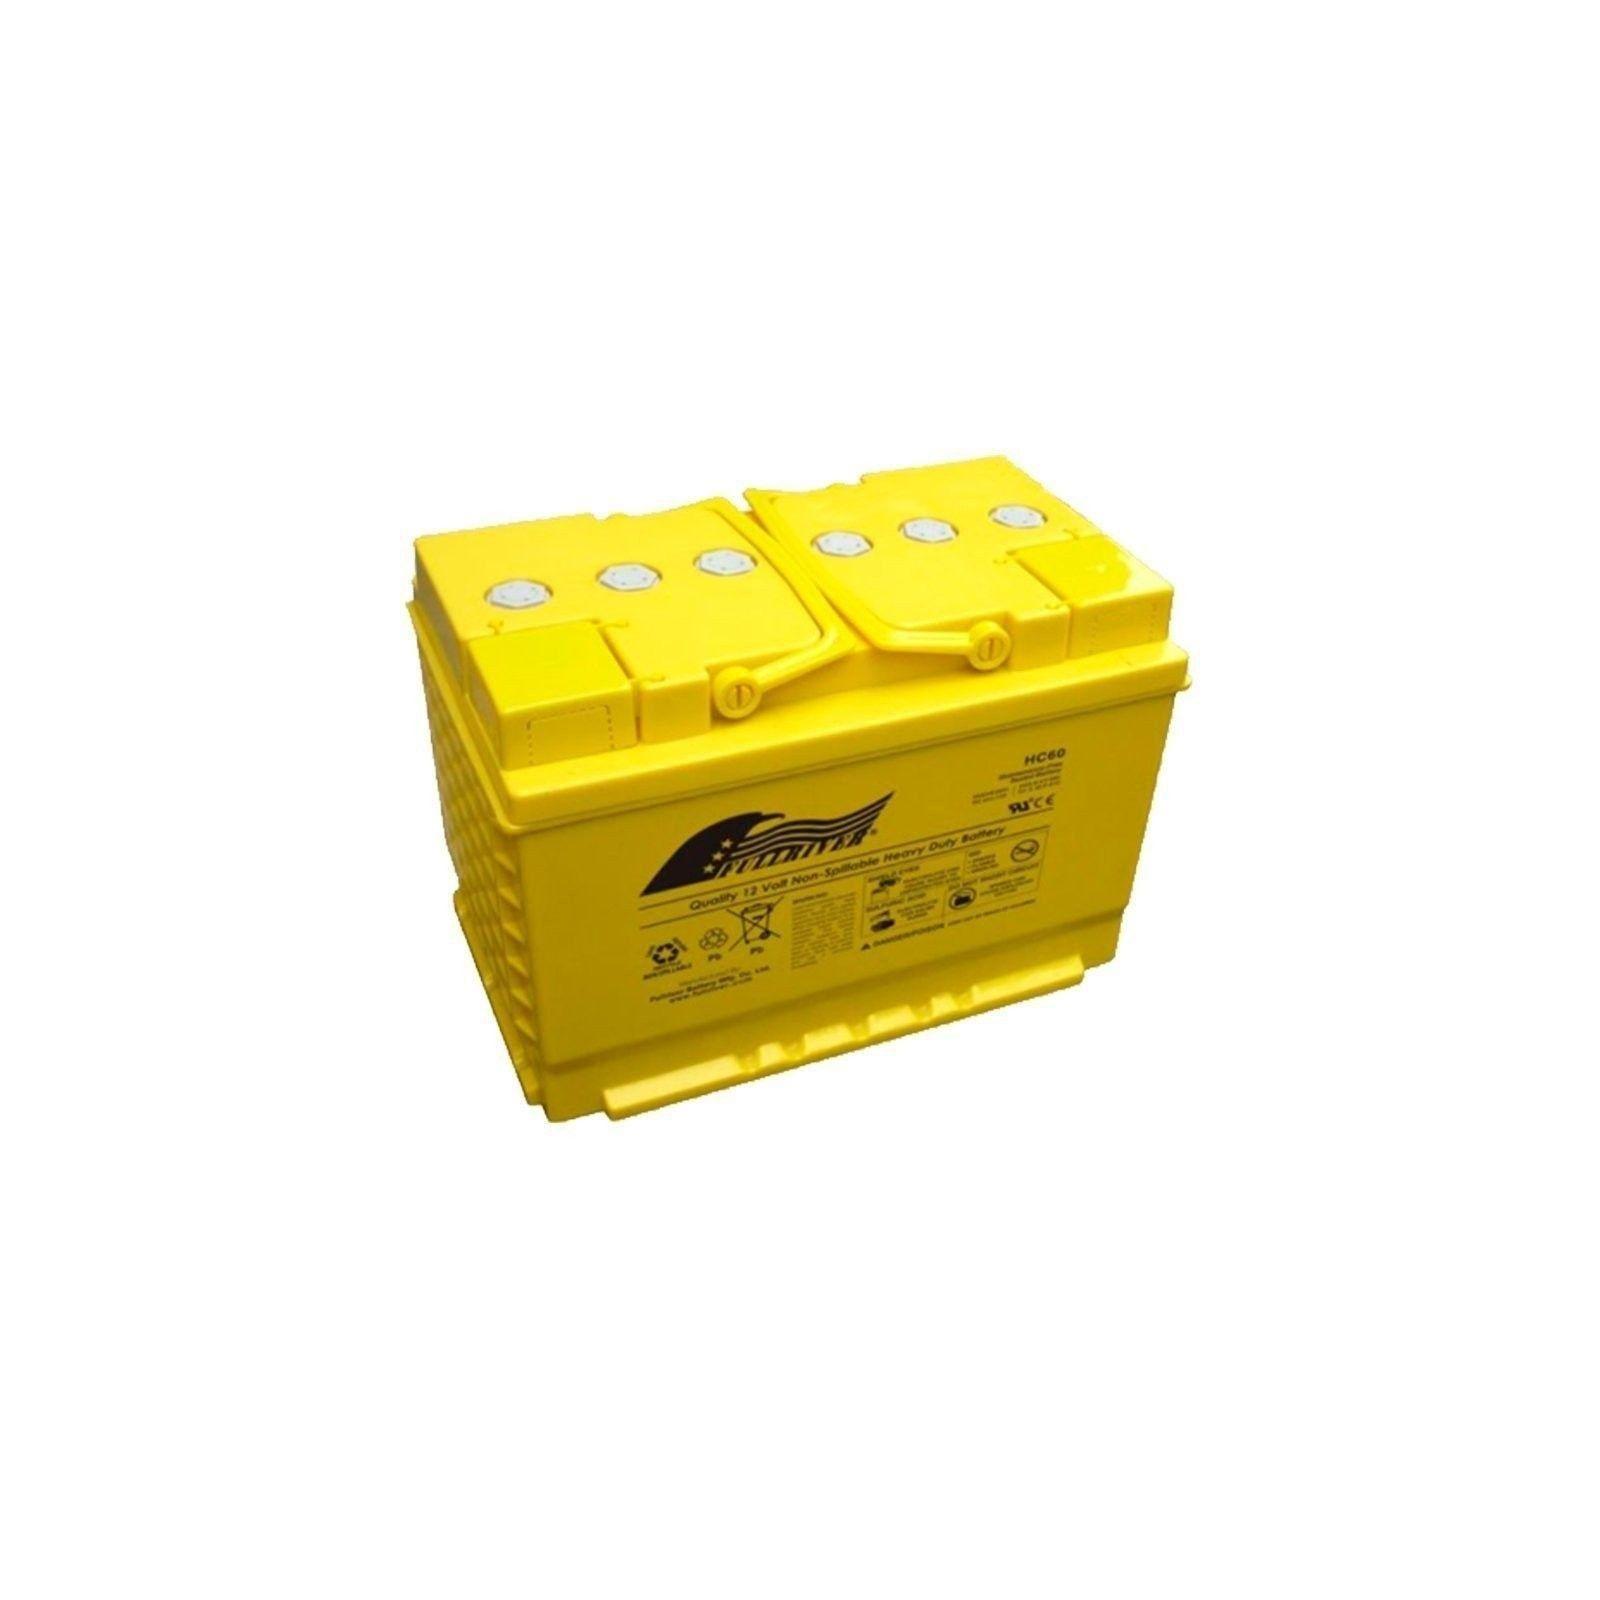 BATERIA Fullriver FULLRIVER HC60 60Ah 700A 12V FULLRIVER - 1